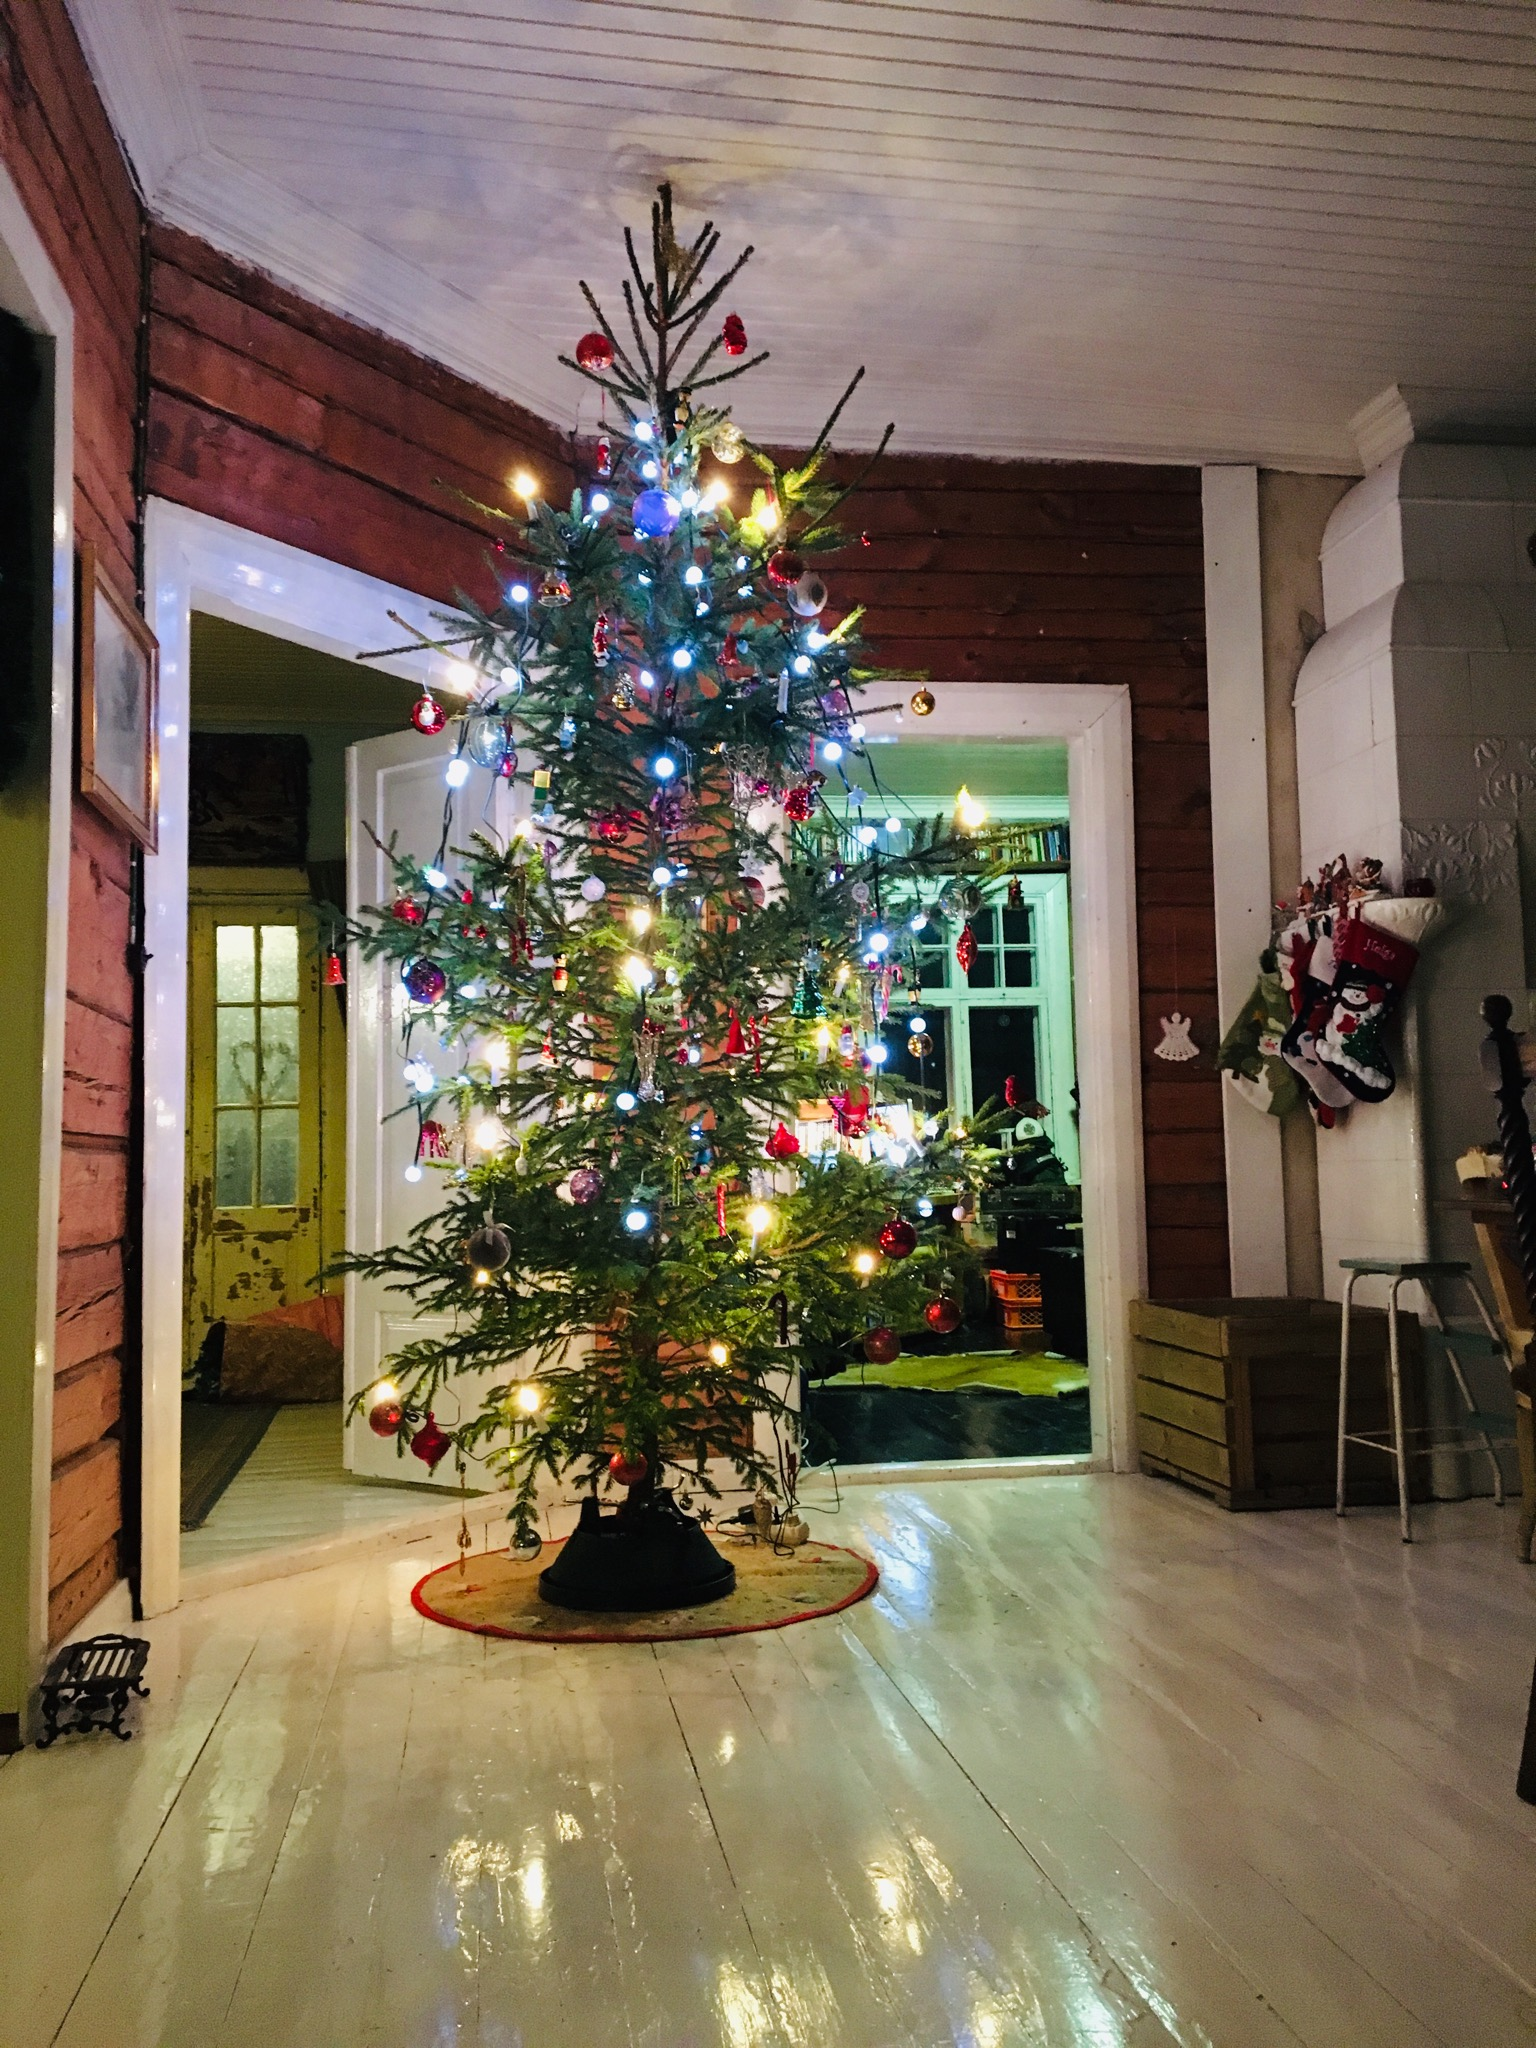 old wooden house, old house, Christmas decorations, joulupuu, joulukuusi, aito joulukuusi, cristmas decor, Christmas tree, Christmas tree decosrations